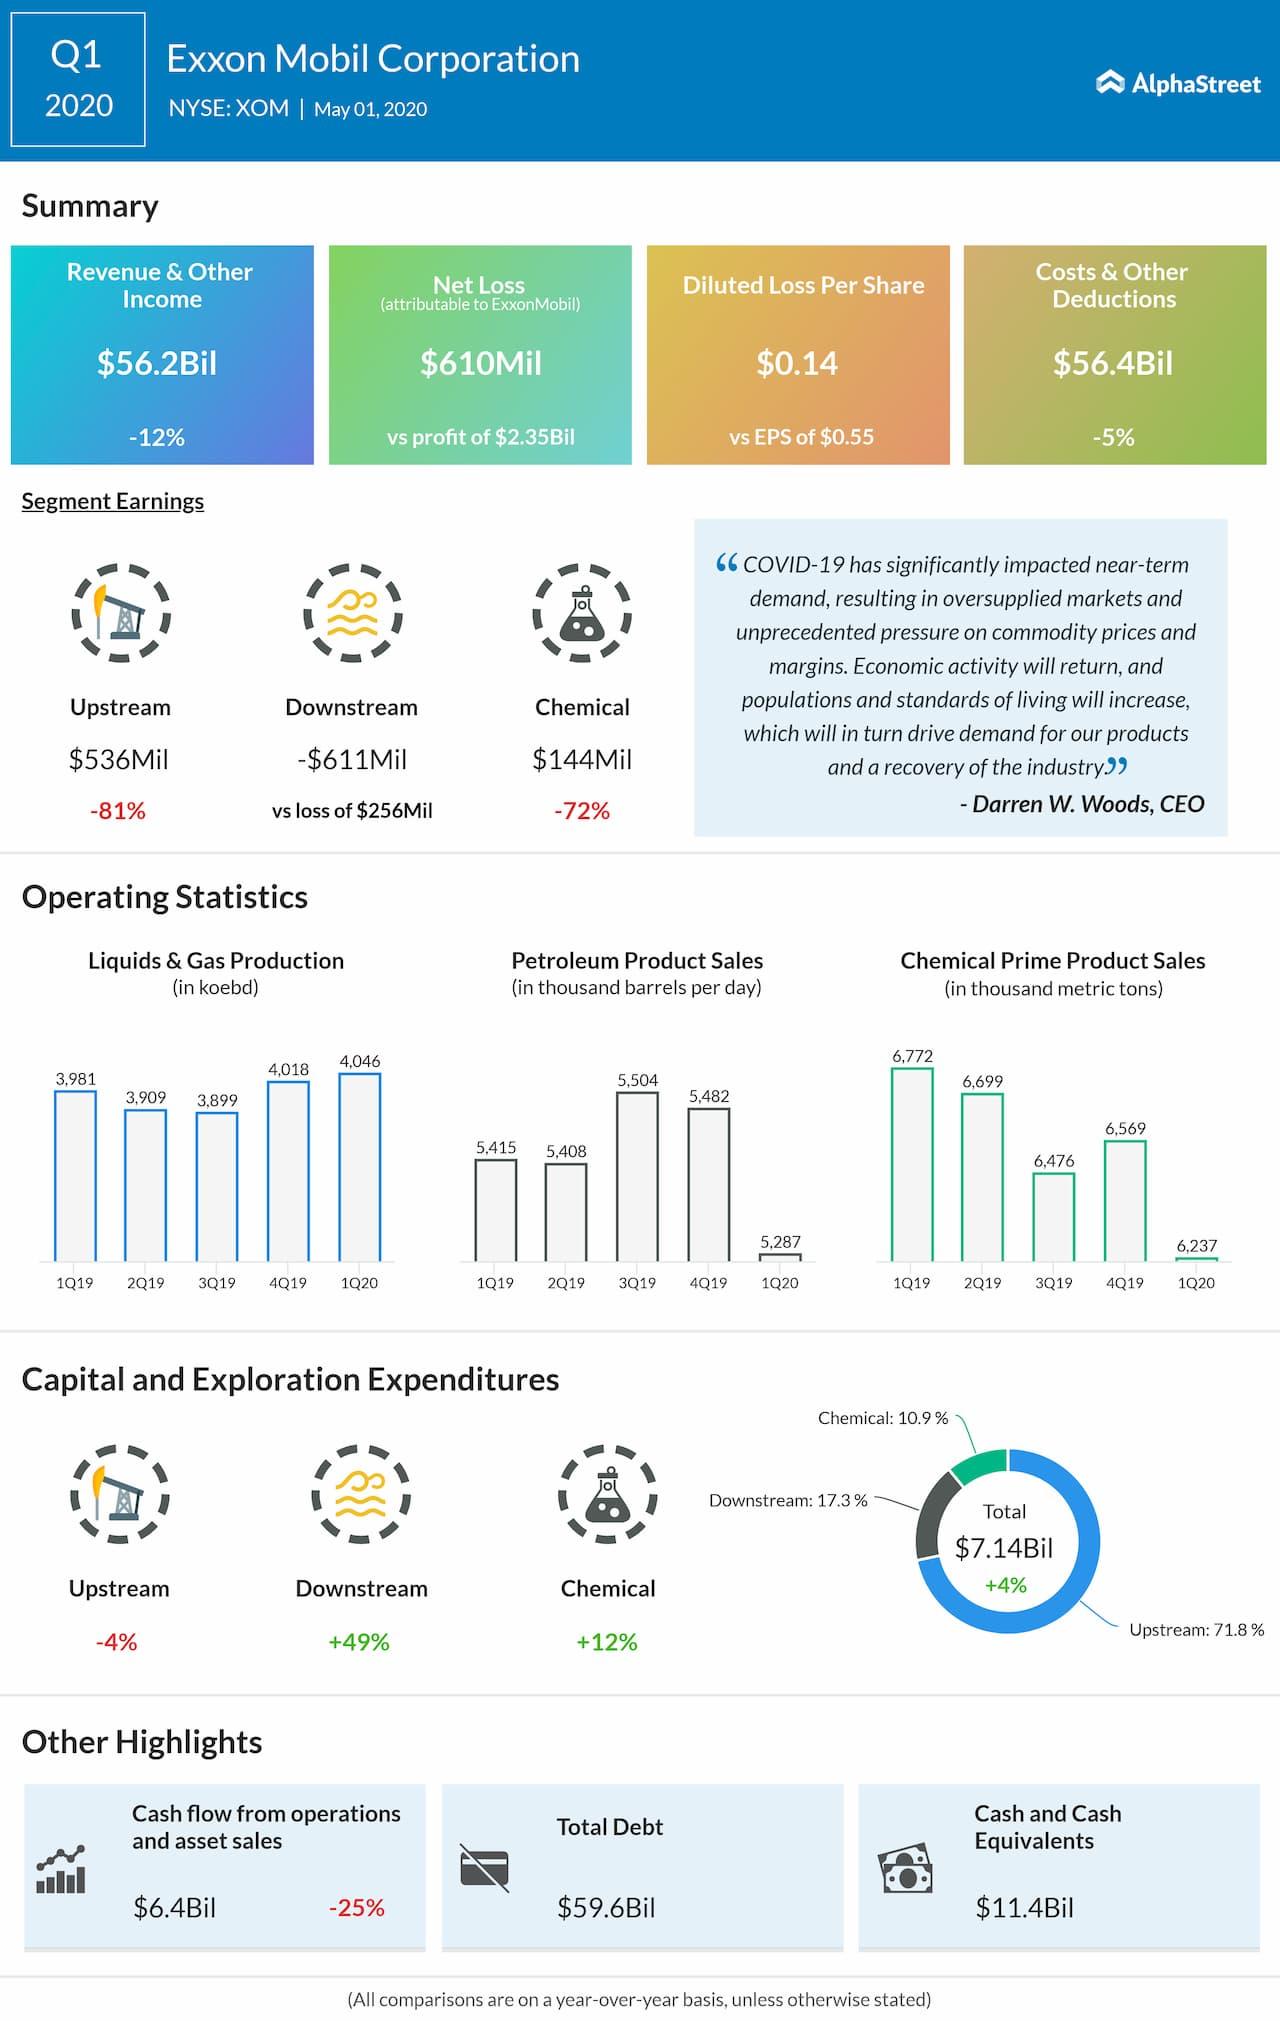 ExxonMobil (XOM) Q1 2020 earnings review